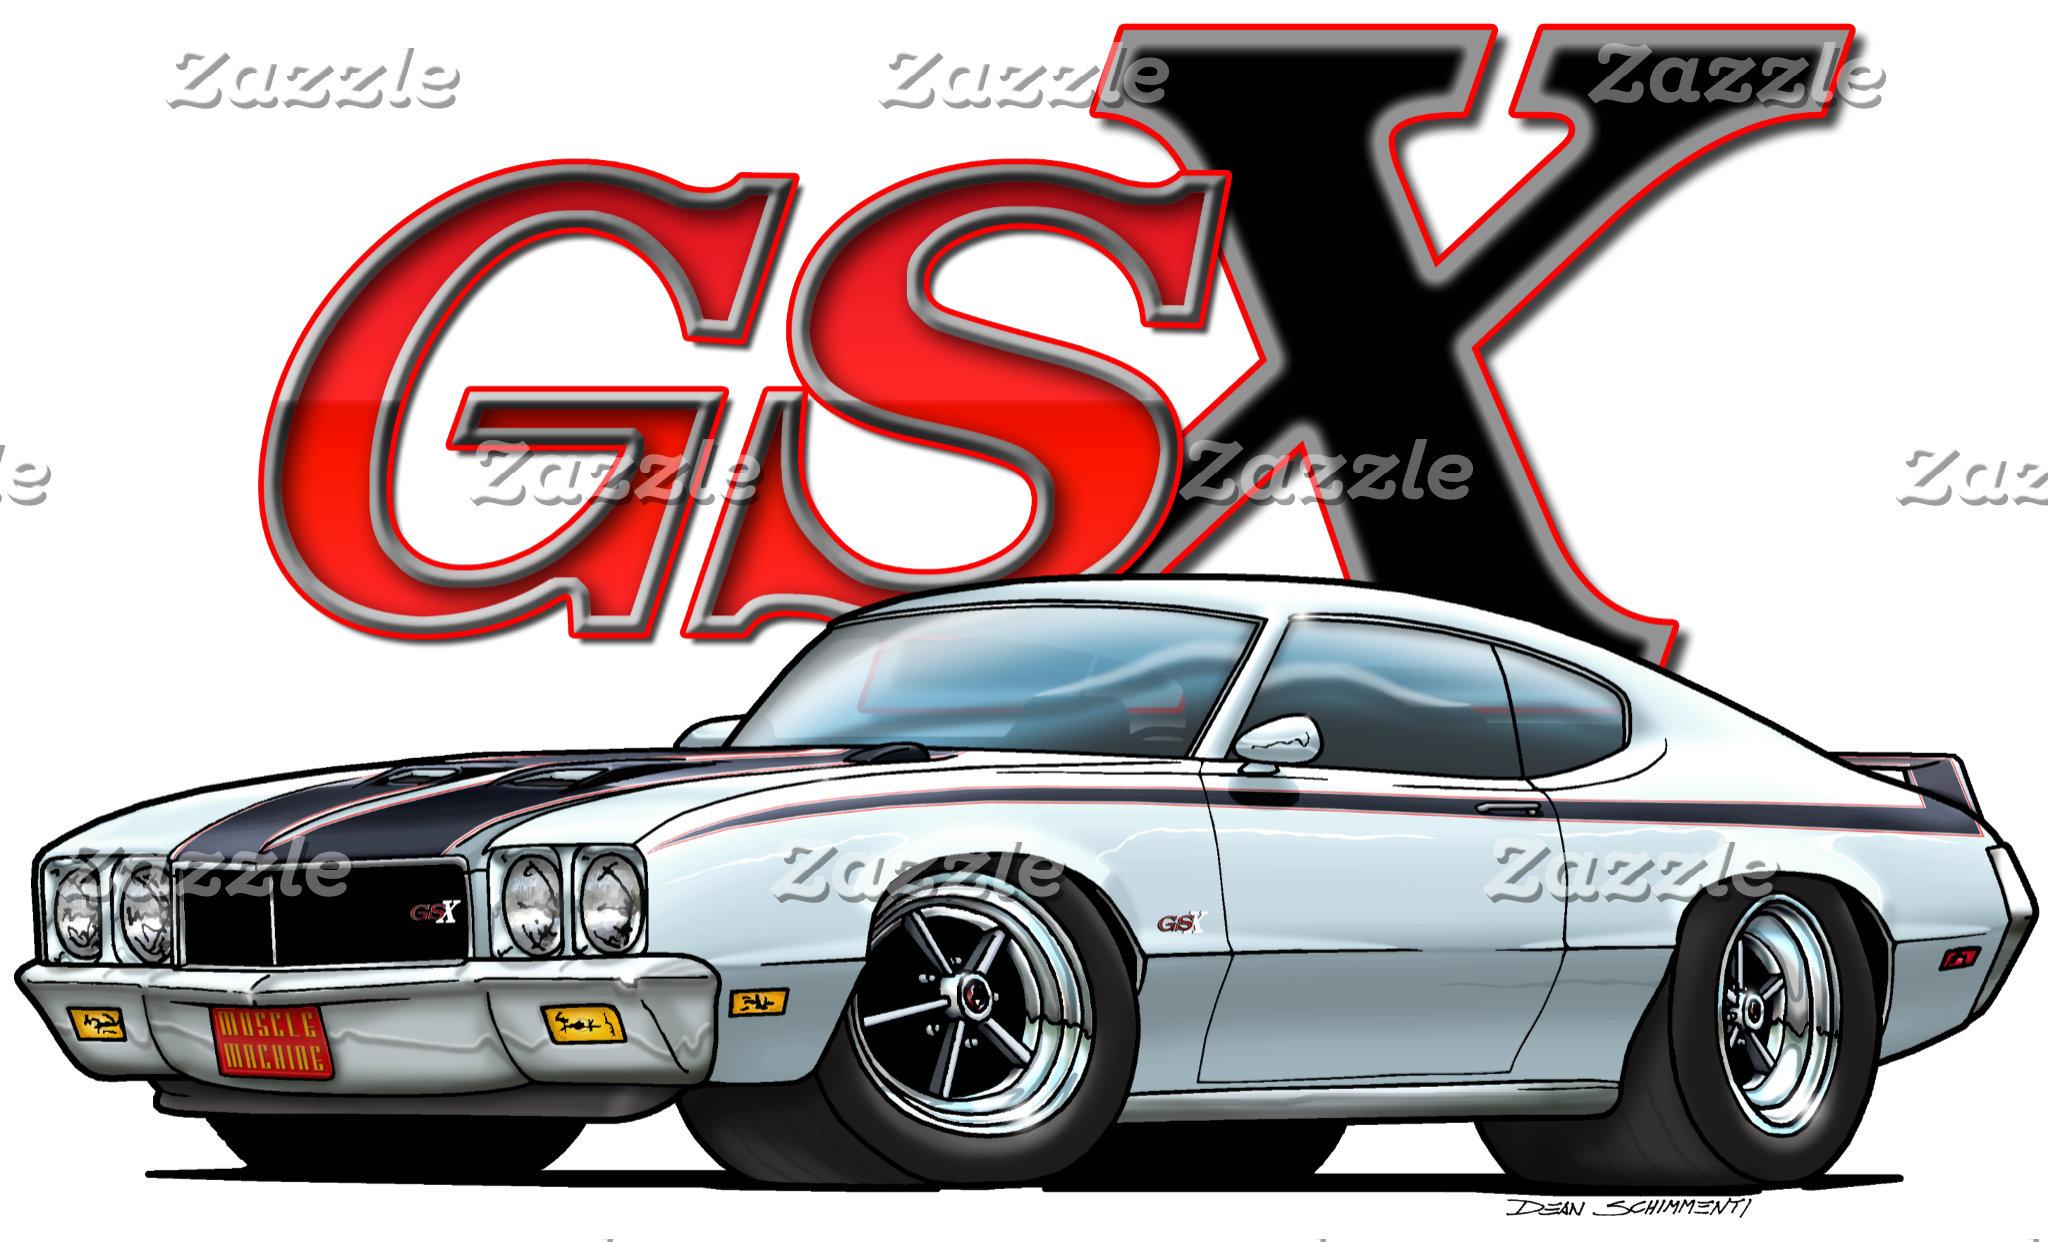 Buick Skylark, GS, and GSX